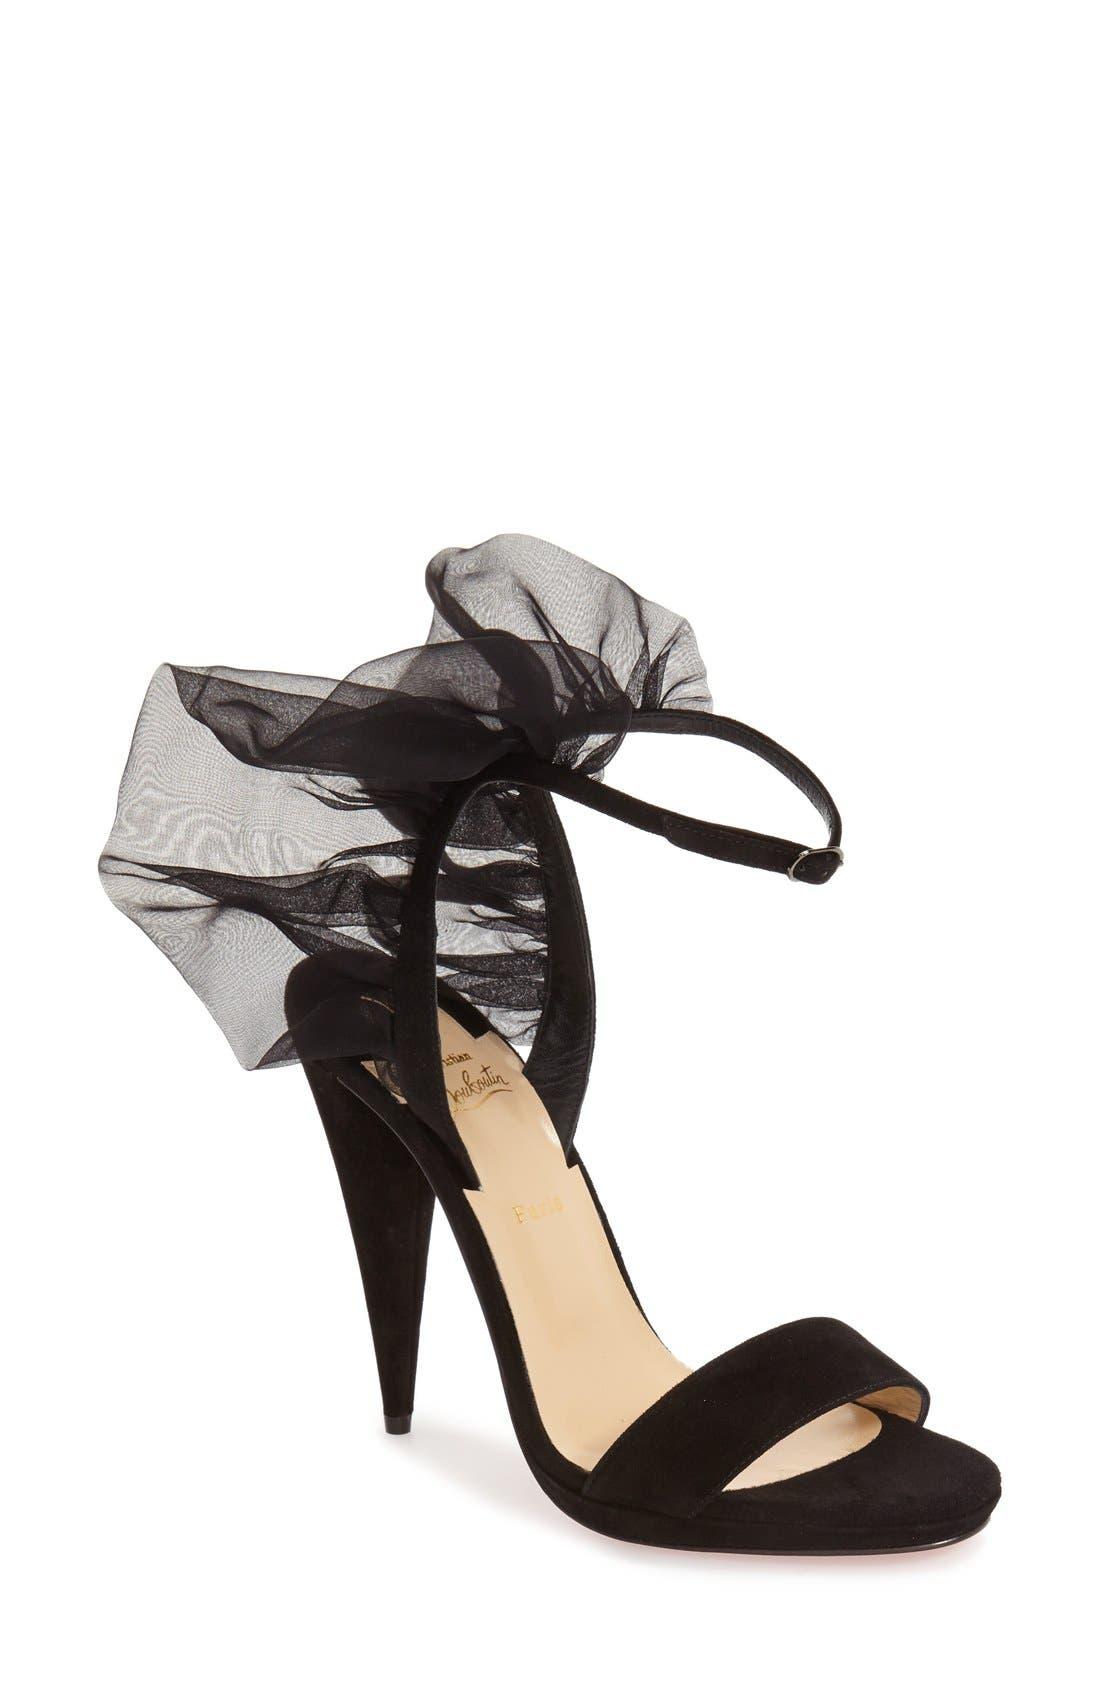 Main Image - Christian Louboutin 'Jacqueline' Sandal